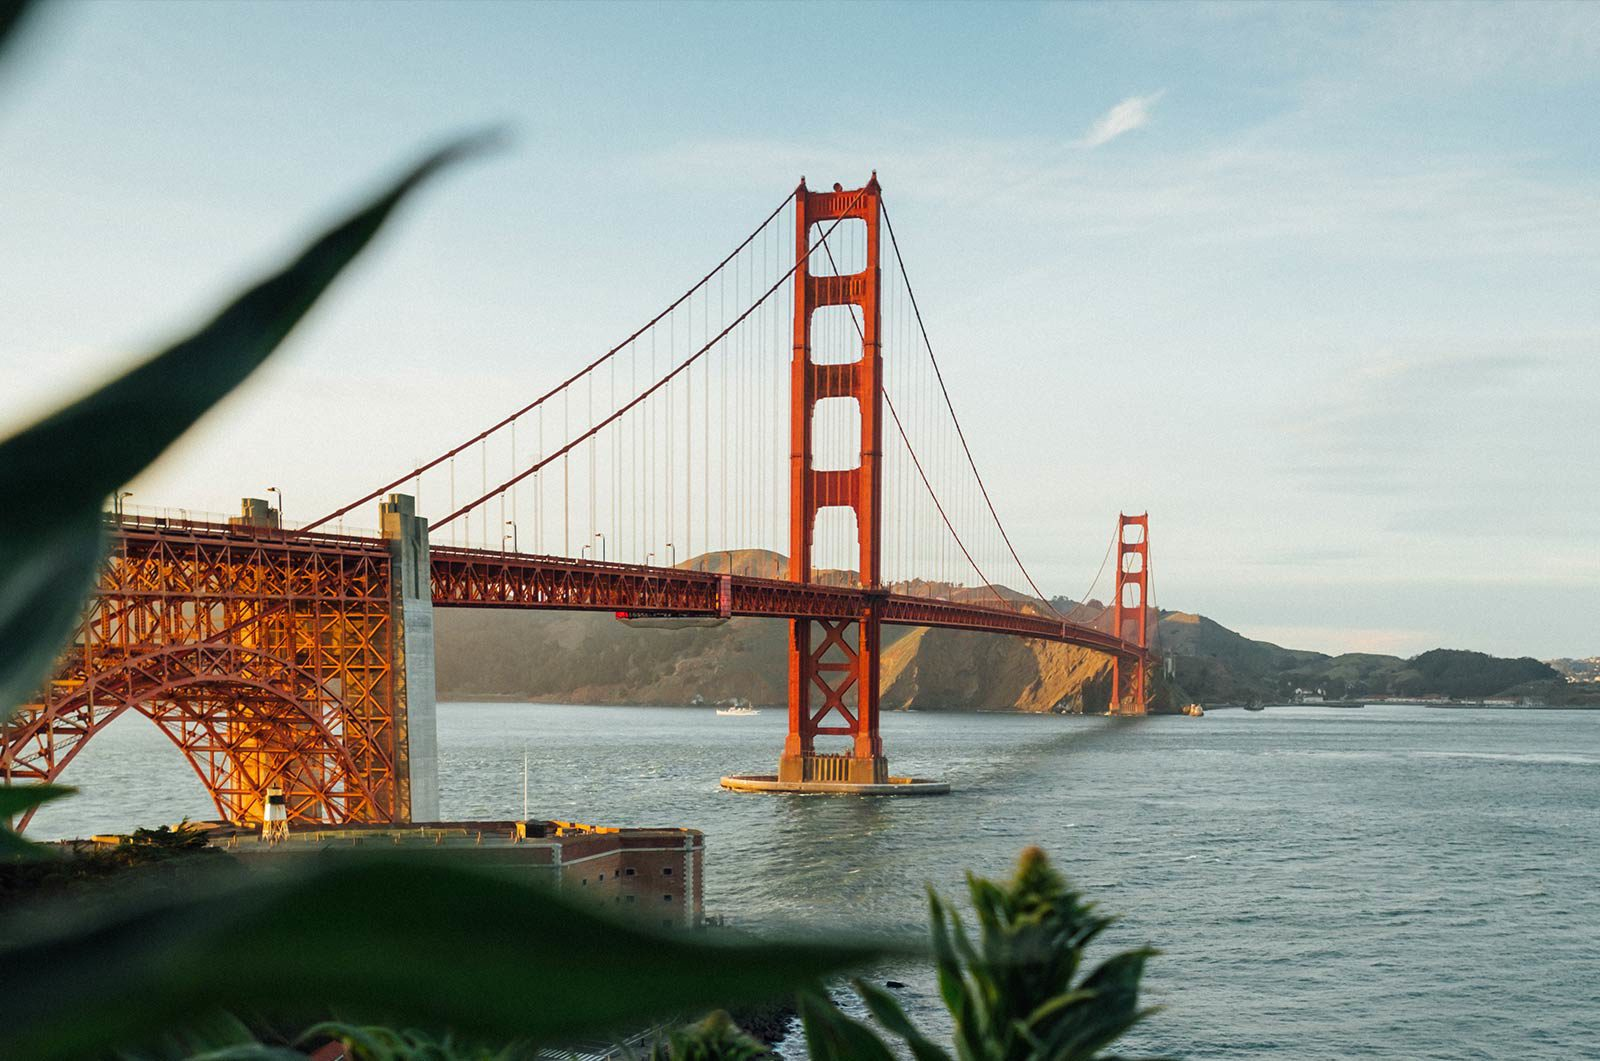 Side view of Golden Gate Bridge, San Francisco.